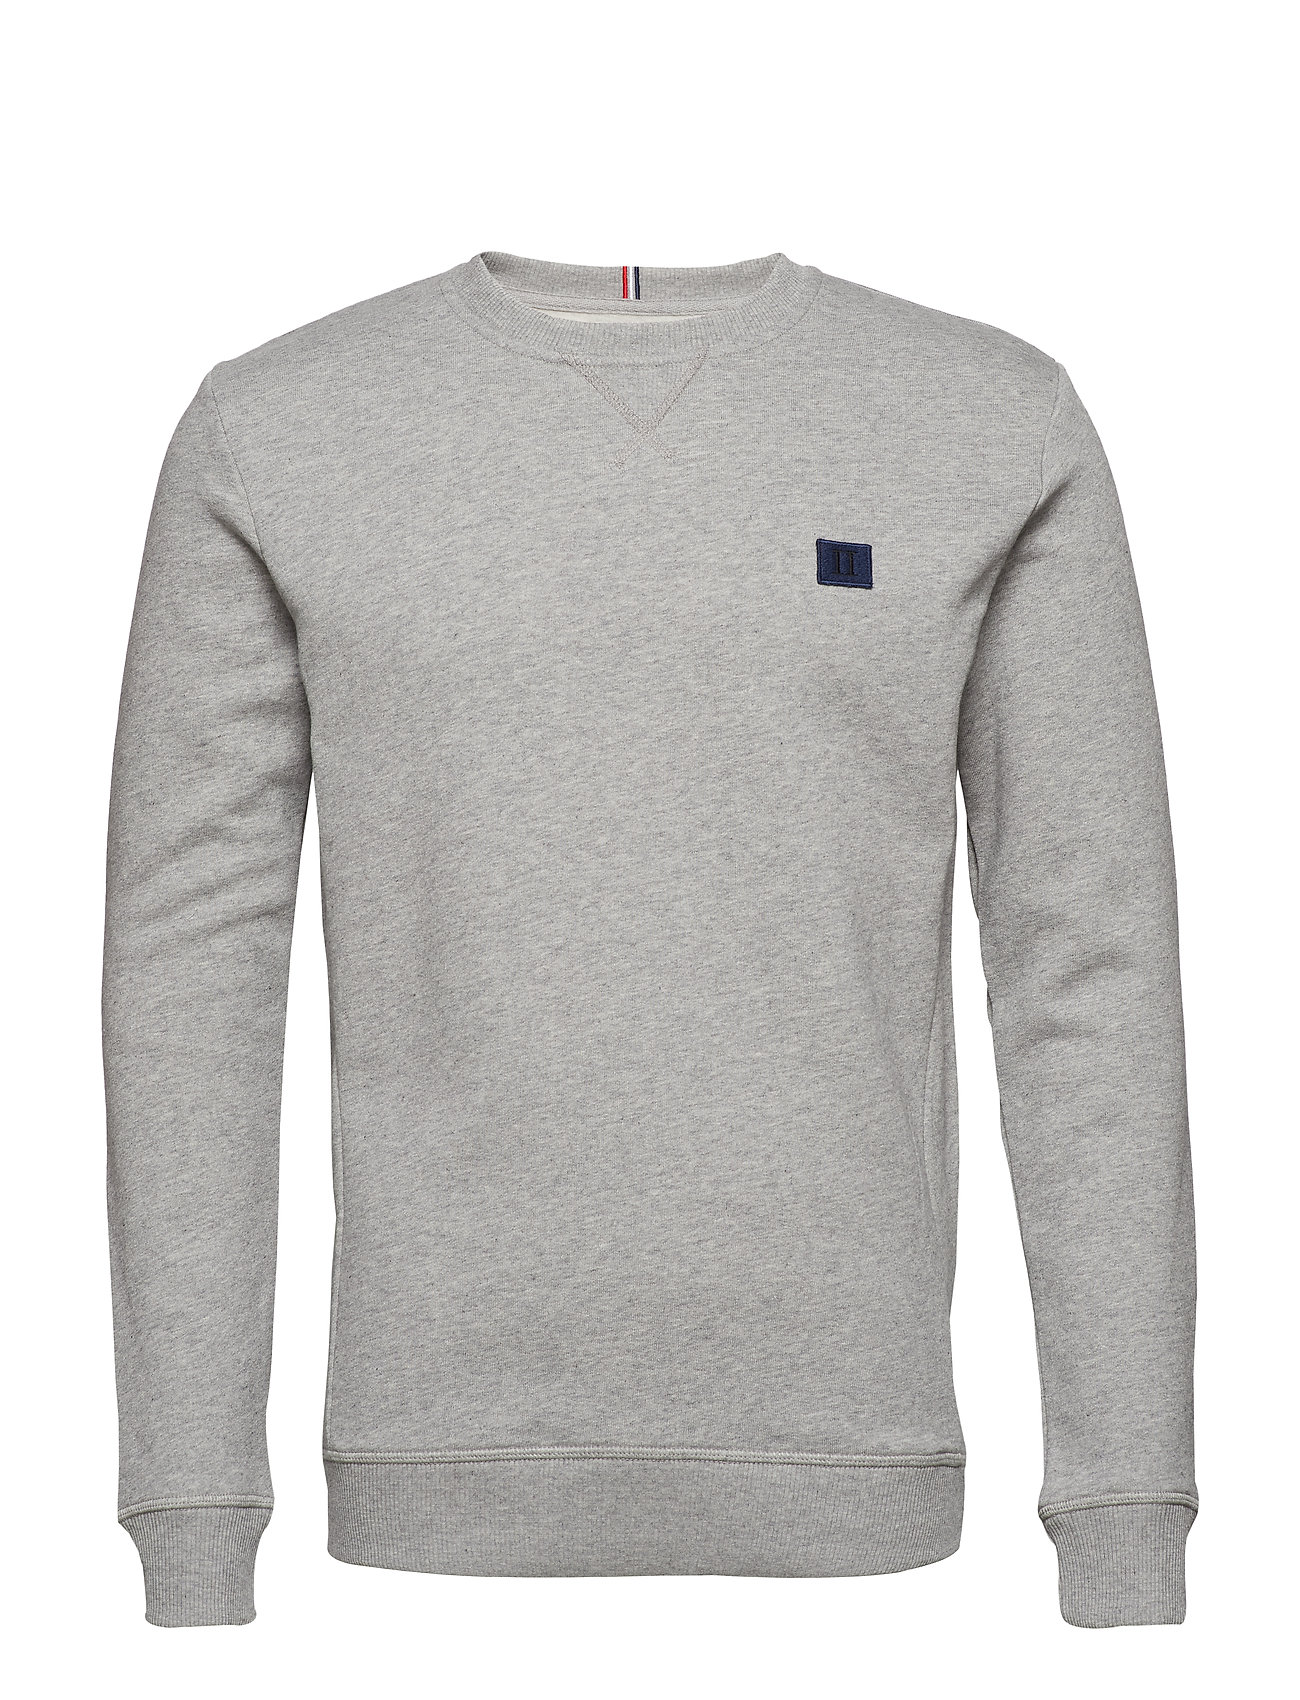 Image of Piece Sweatshirt (3119382147)